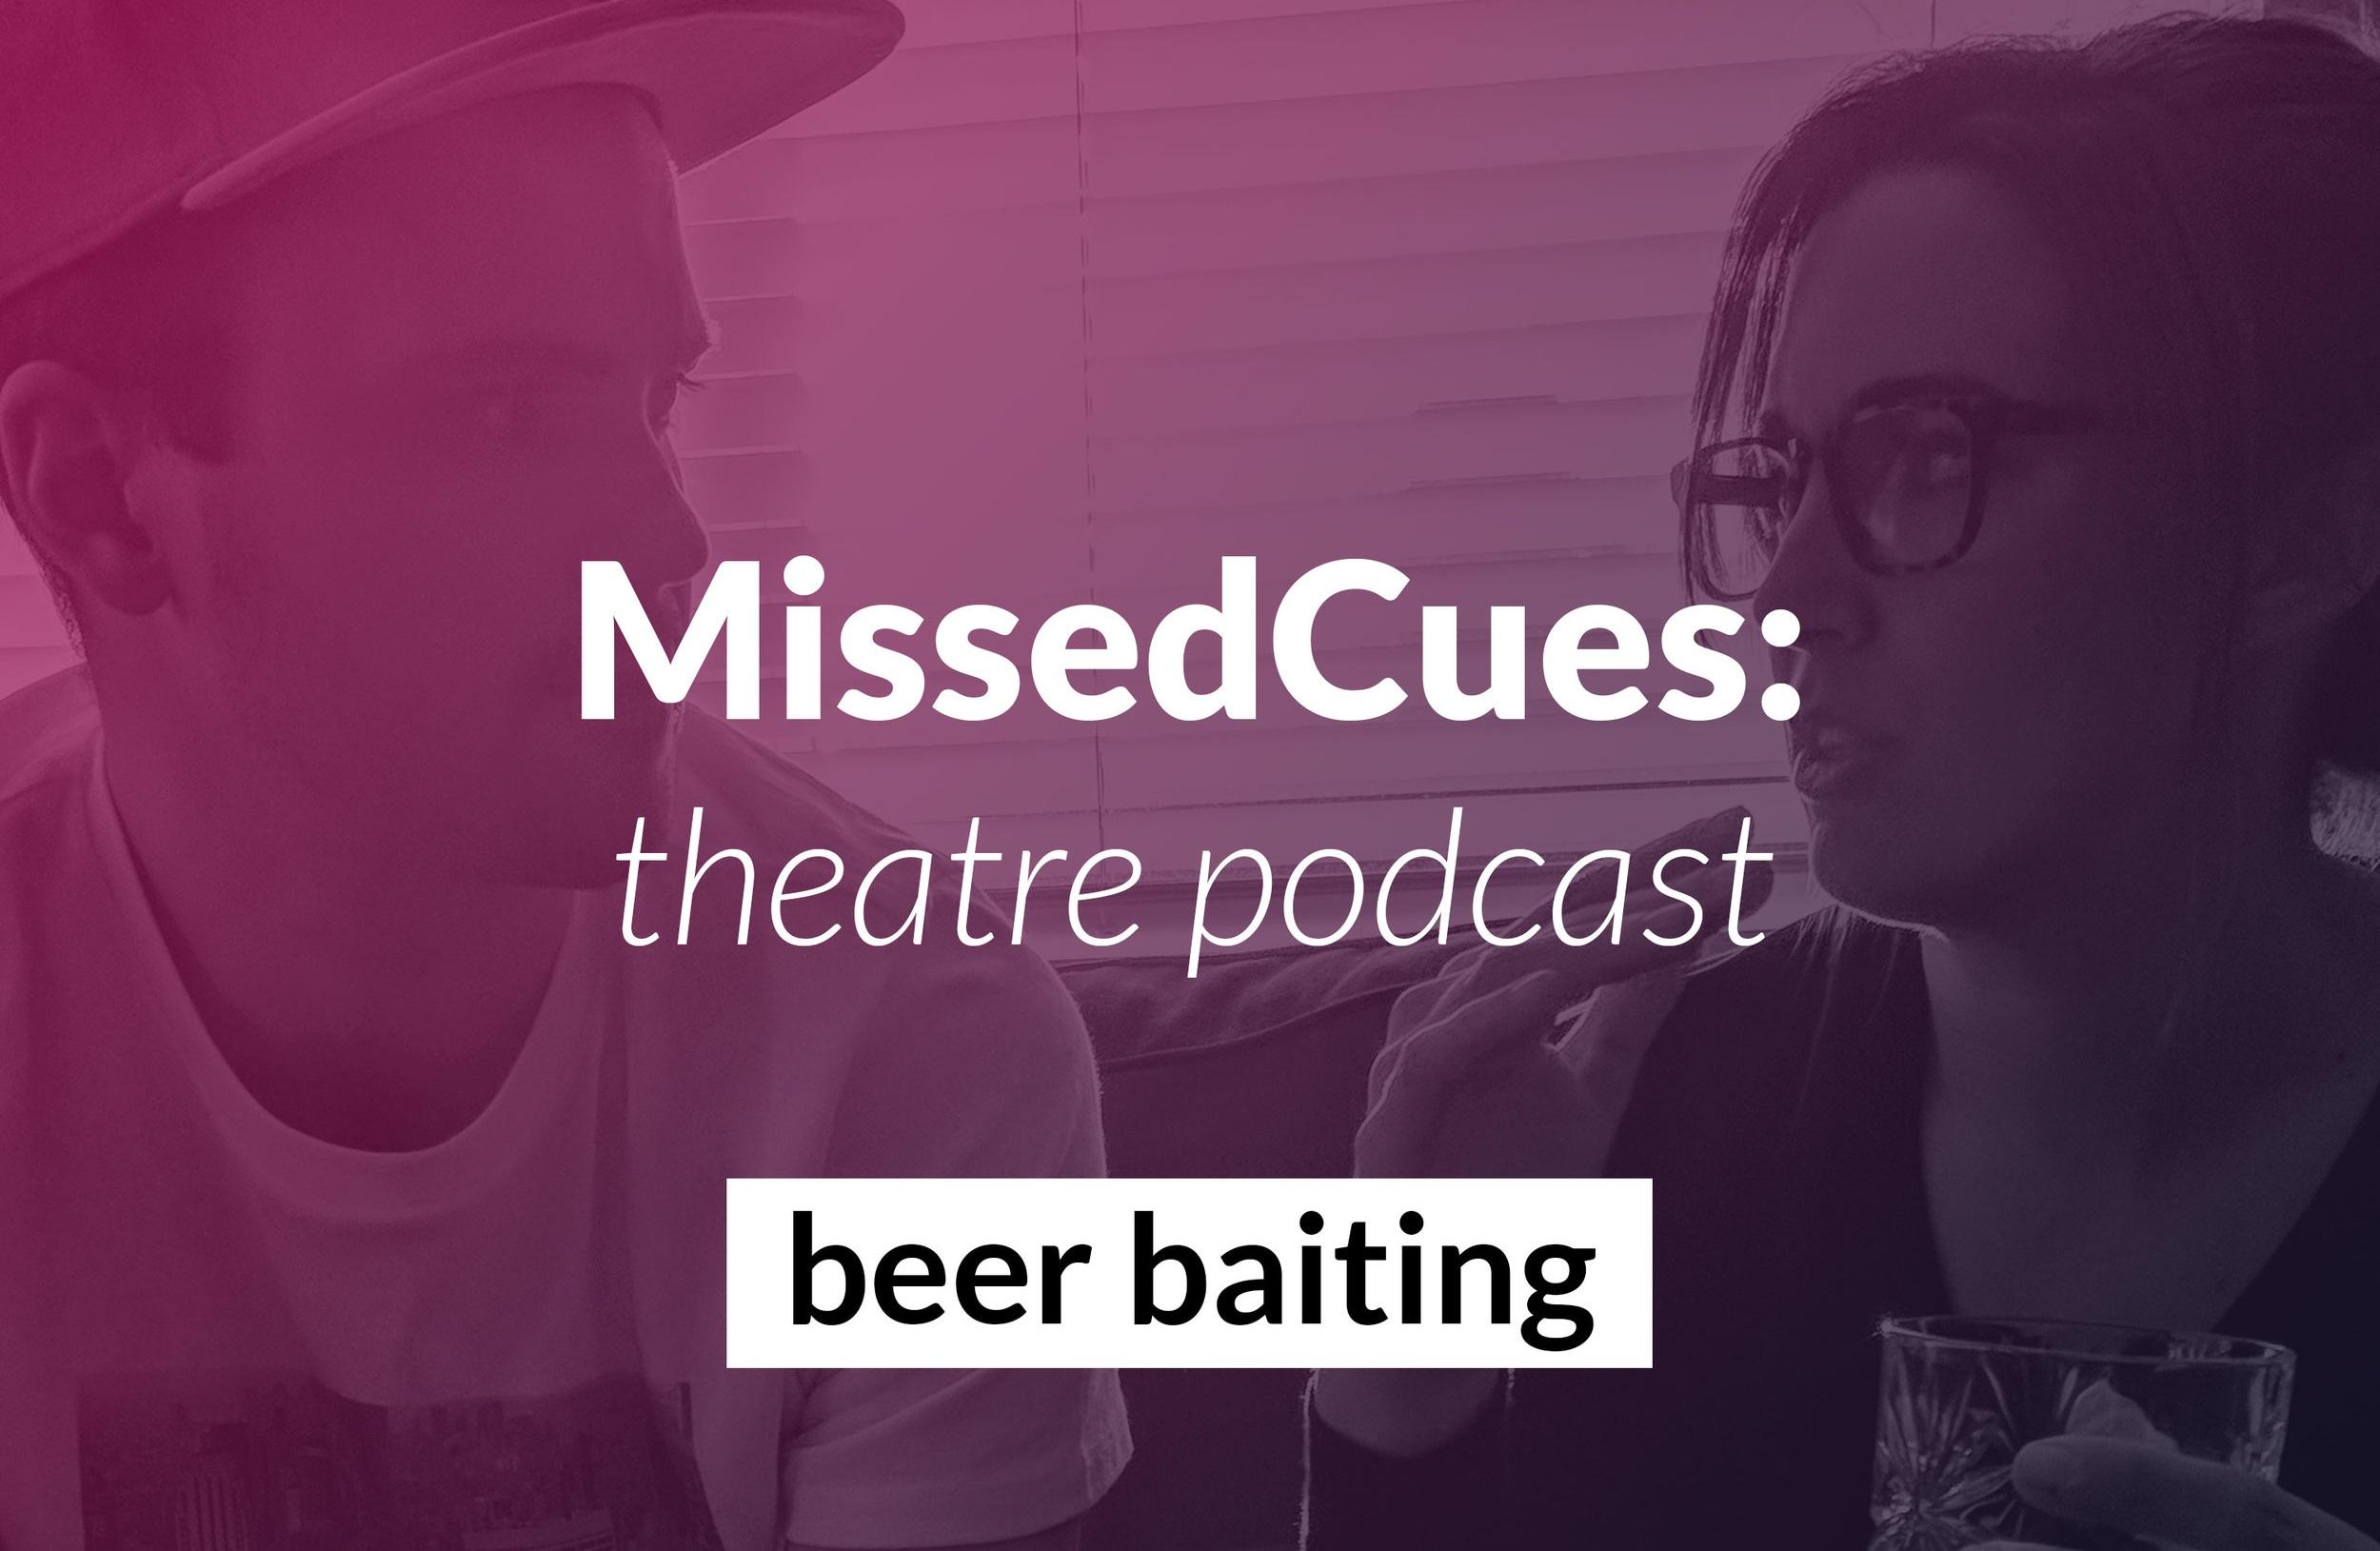 Missed-Cues-Episode-Artwork-E03.jpg